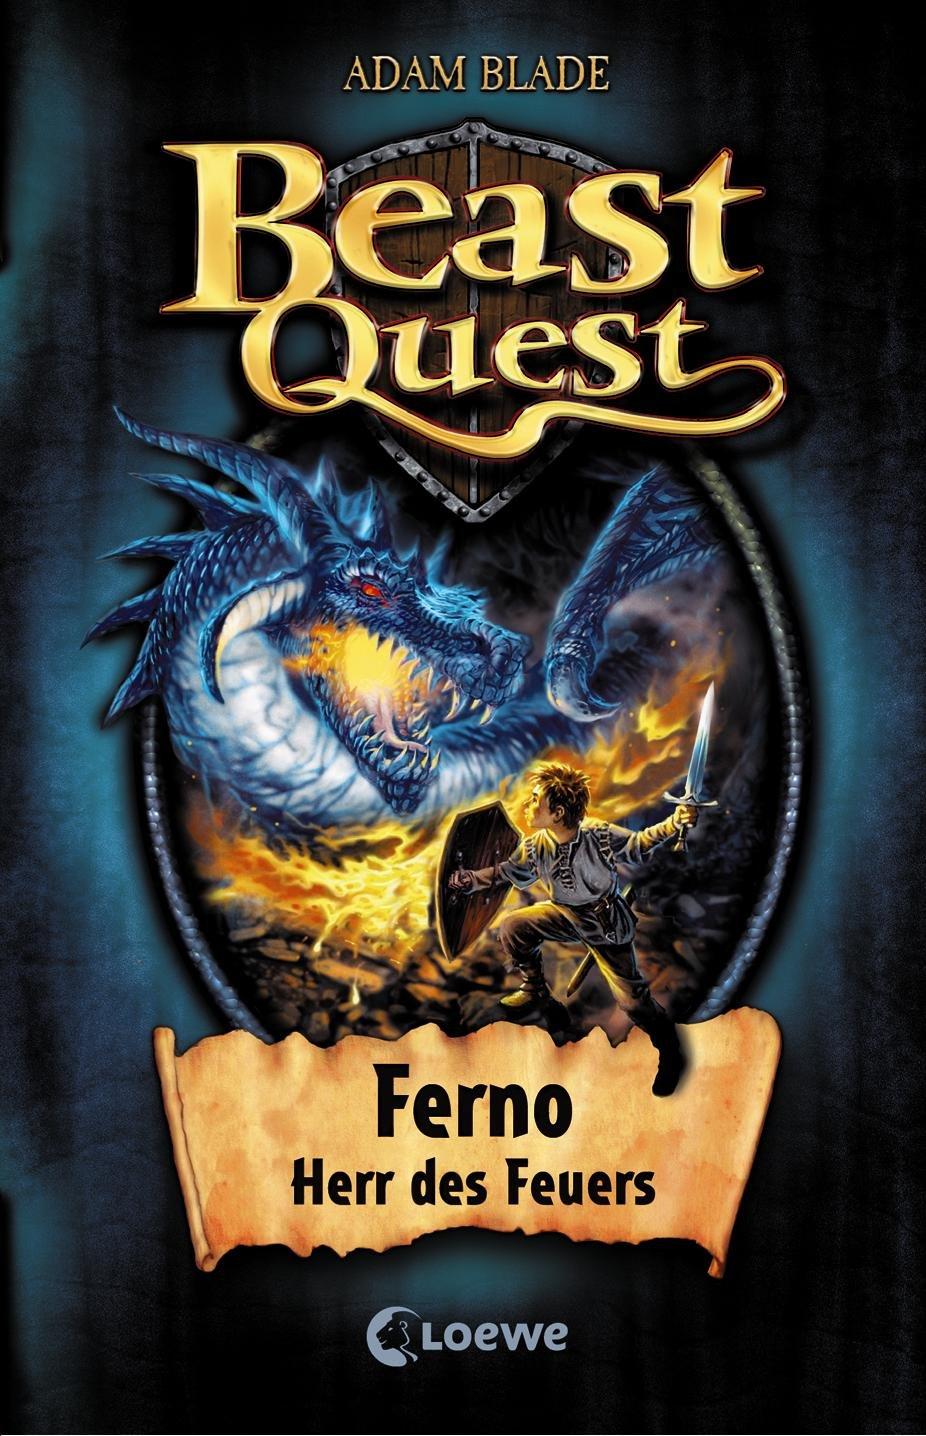 Beast Quest 01 Ferno Herr Des Feuers Amazon Co Uk Blade Adam Wyatt David Wiese Petra 9783785561553 Books